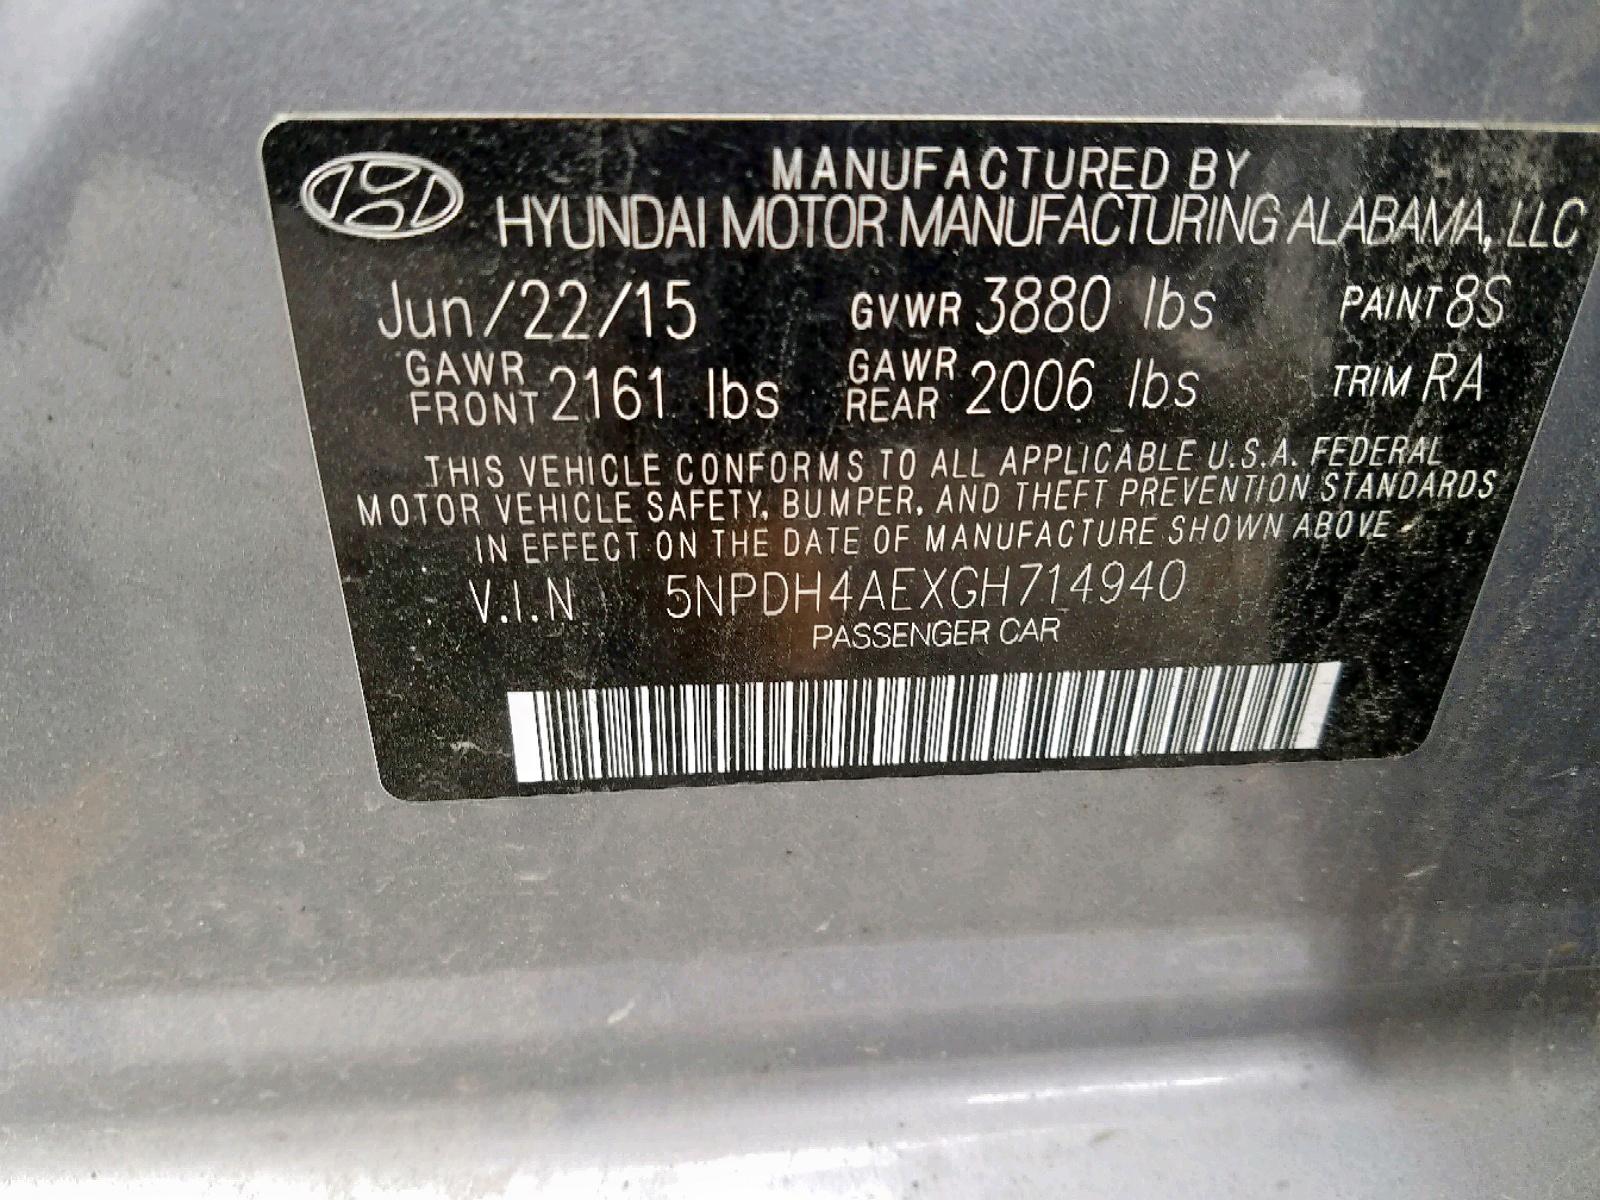 5NPDH4AEXGH714940 - 2016 Hyundai Elantra Se 1.8L